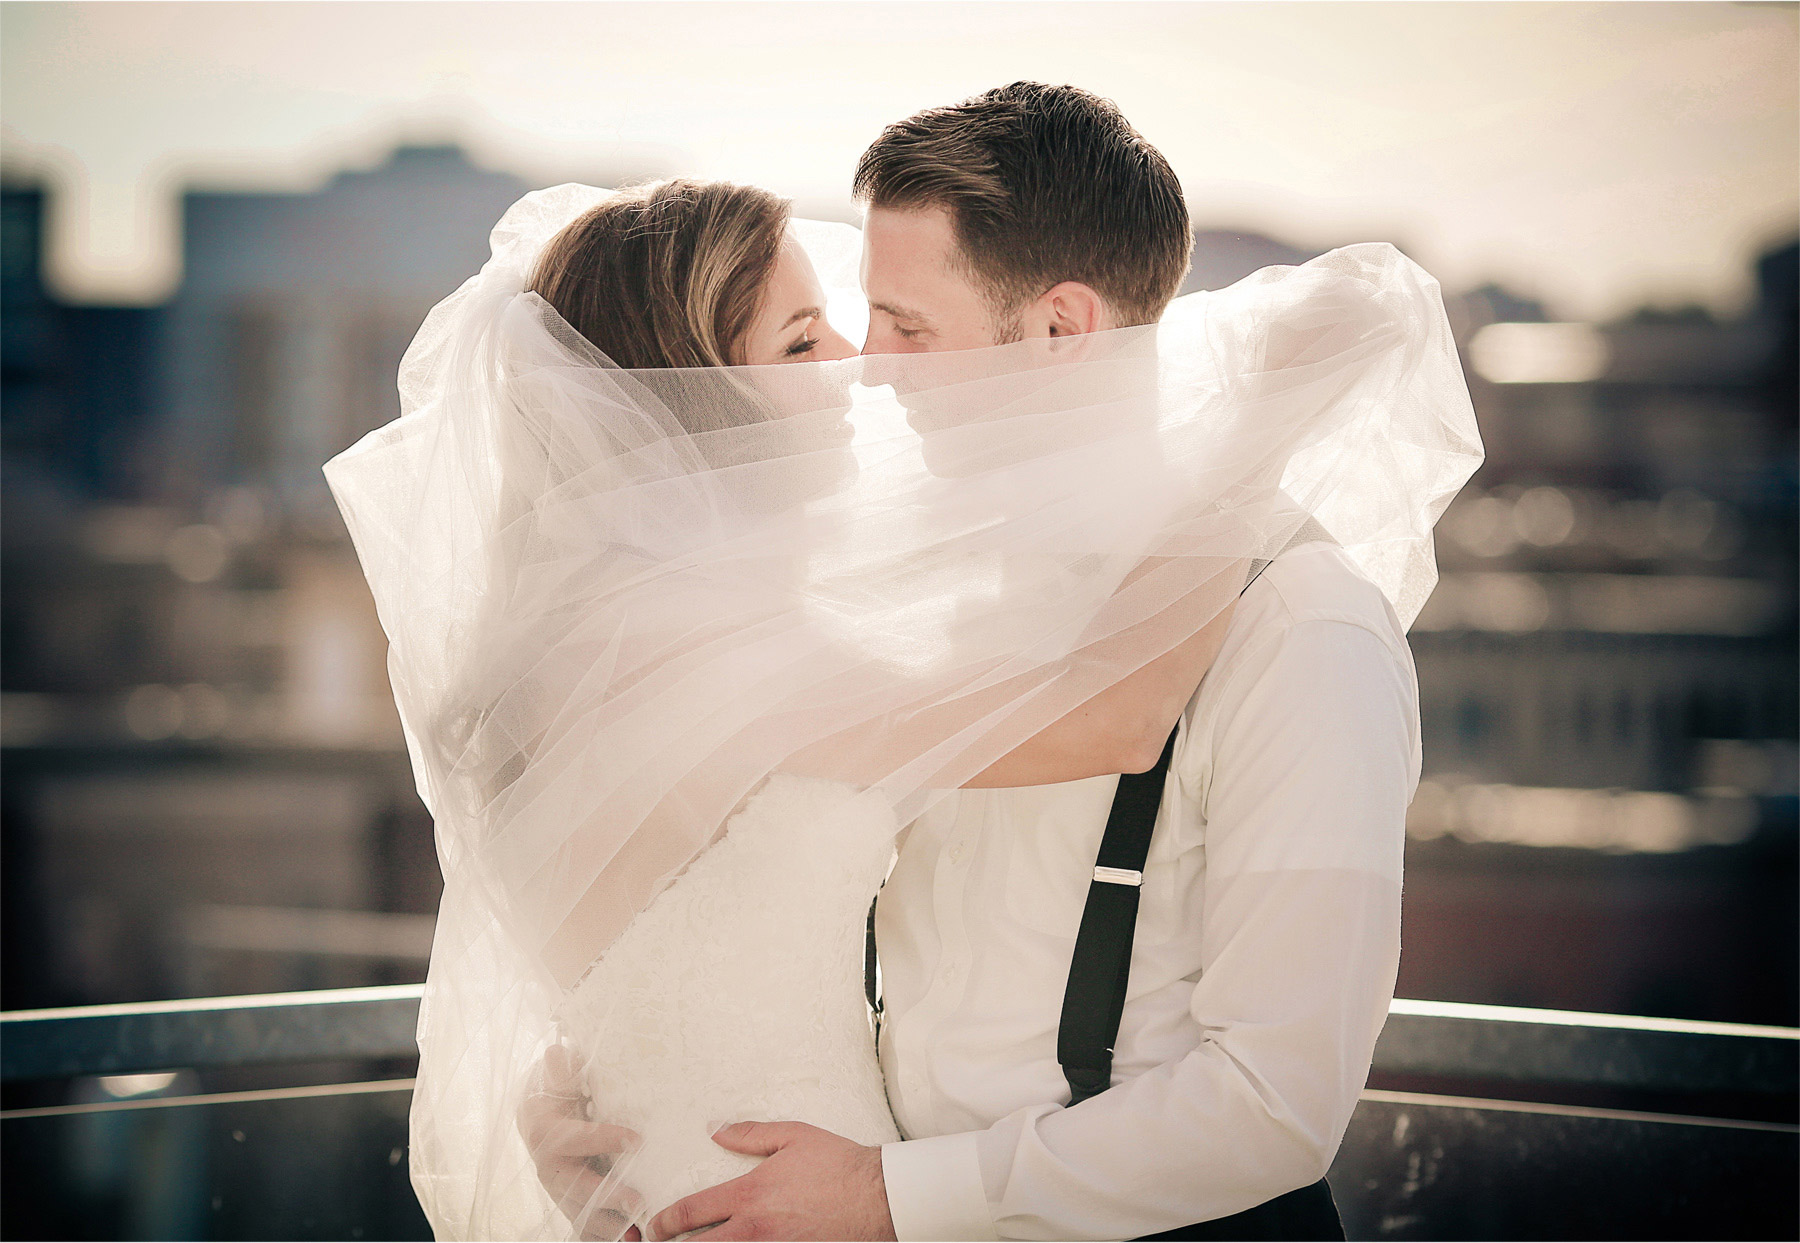 23-Saint-Paul-Minnesota-Wedding-Photographer-by-Andrew-Vick-Photography-Summer-Abulae-Bride-Groom-Suspenders-Veil-Embrace-Vintage-Molly-and-Dan.jpg